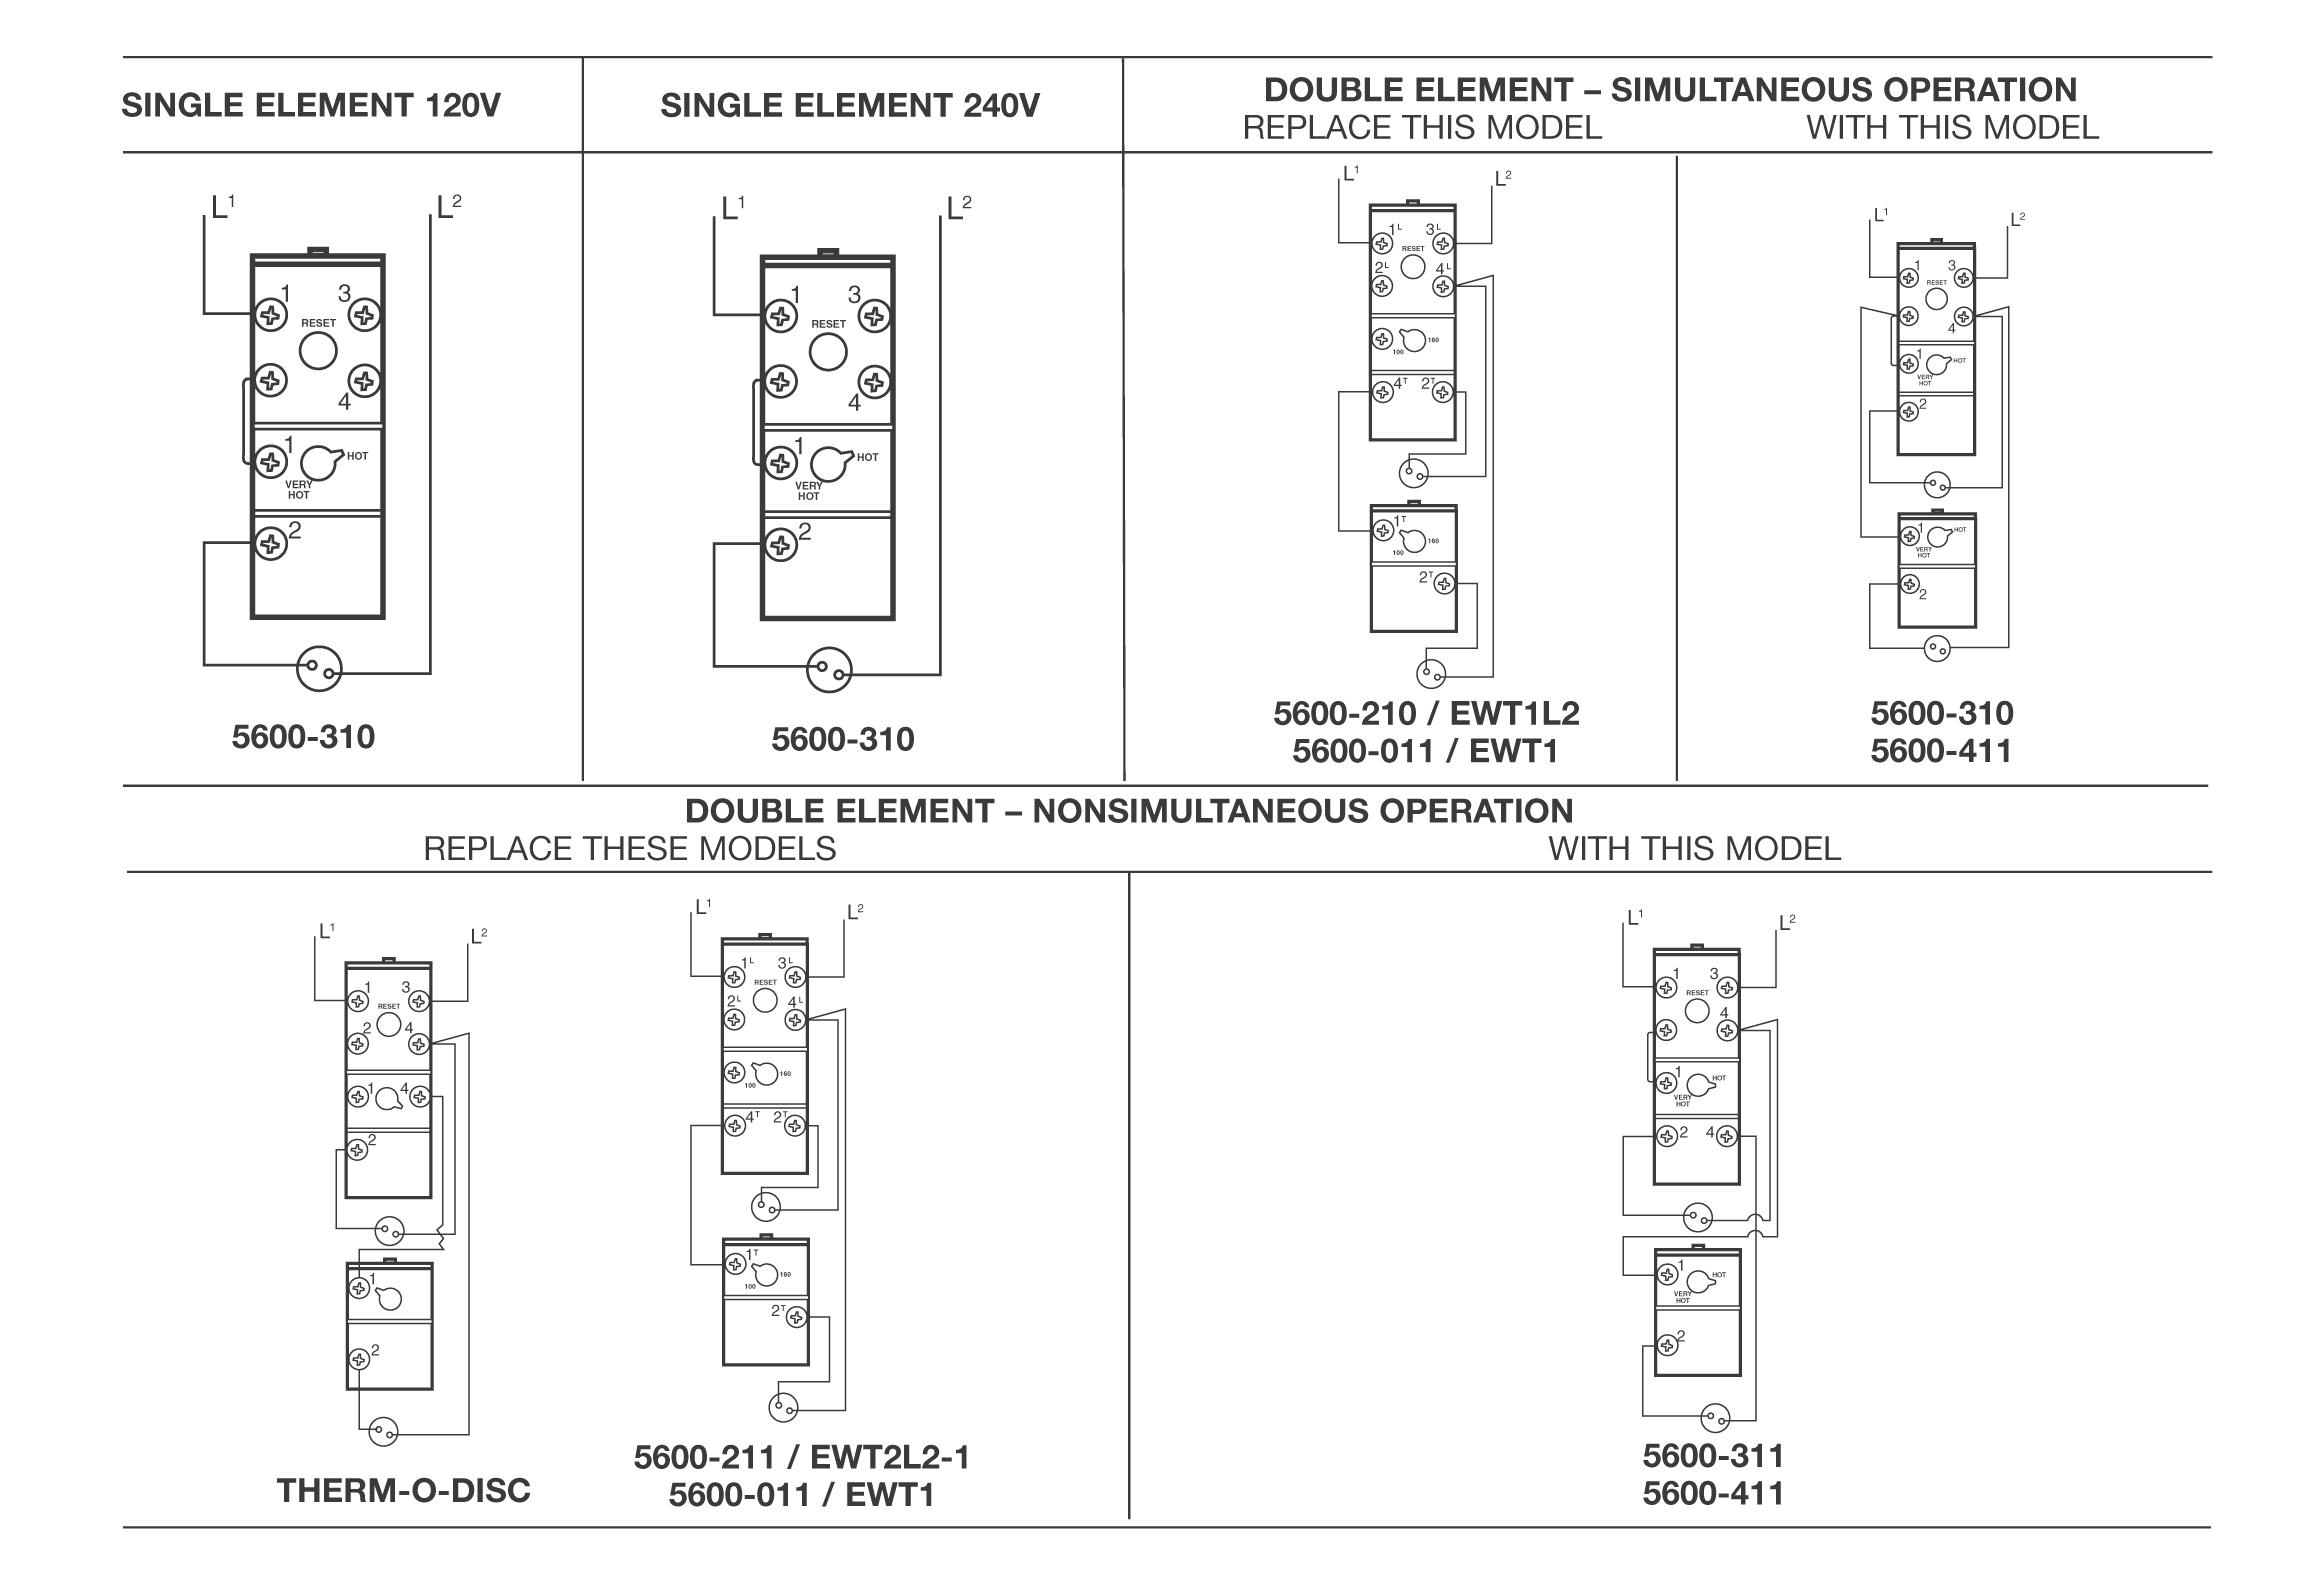 robertshaw products 5600 411wiring diagram robertshaw thermostat 7